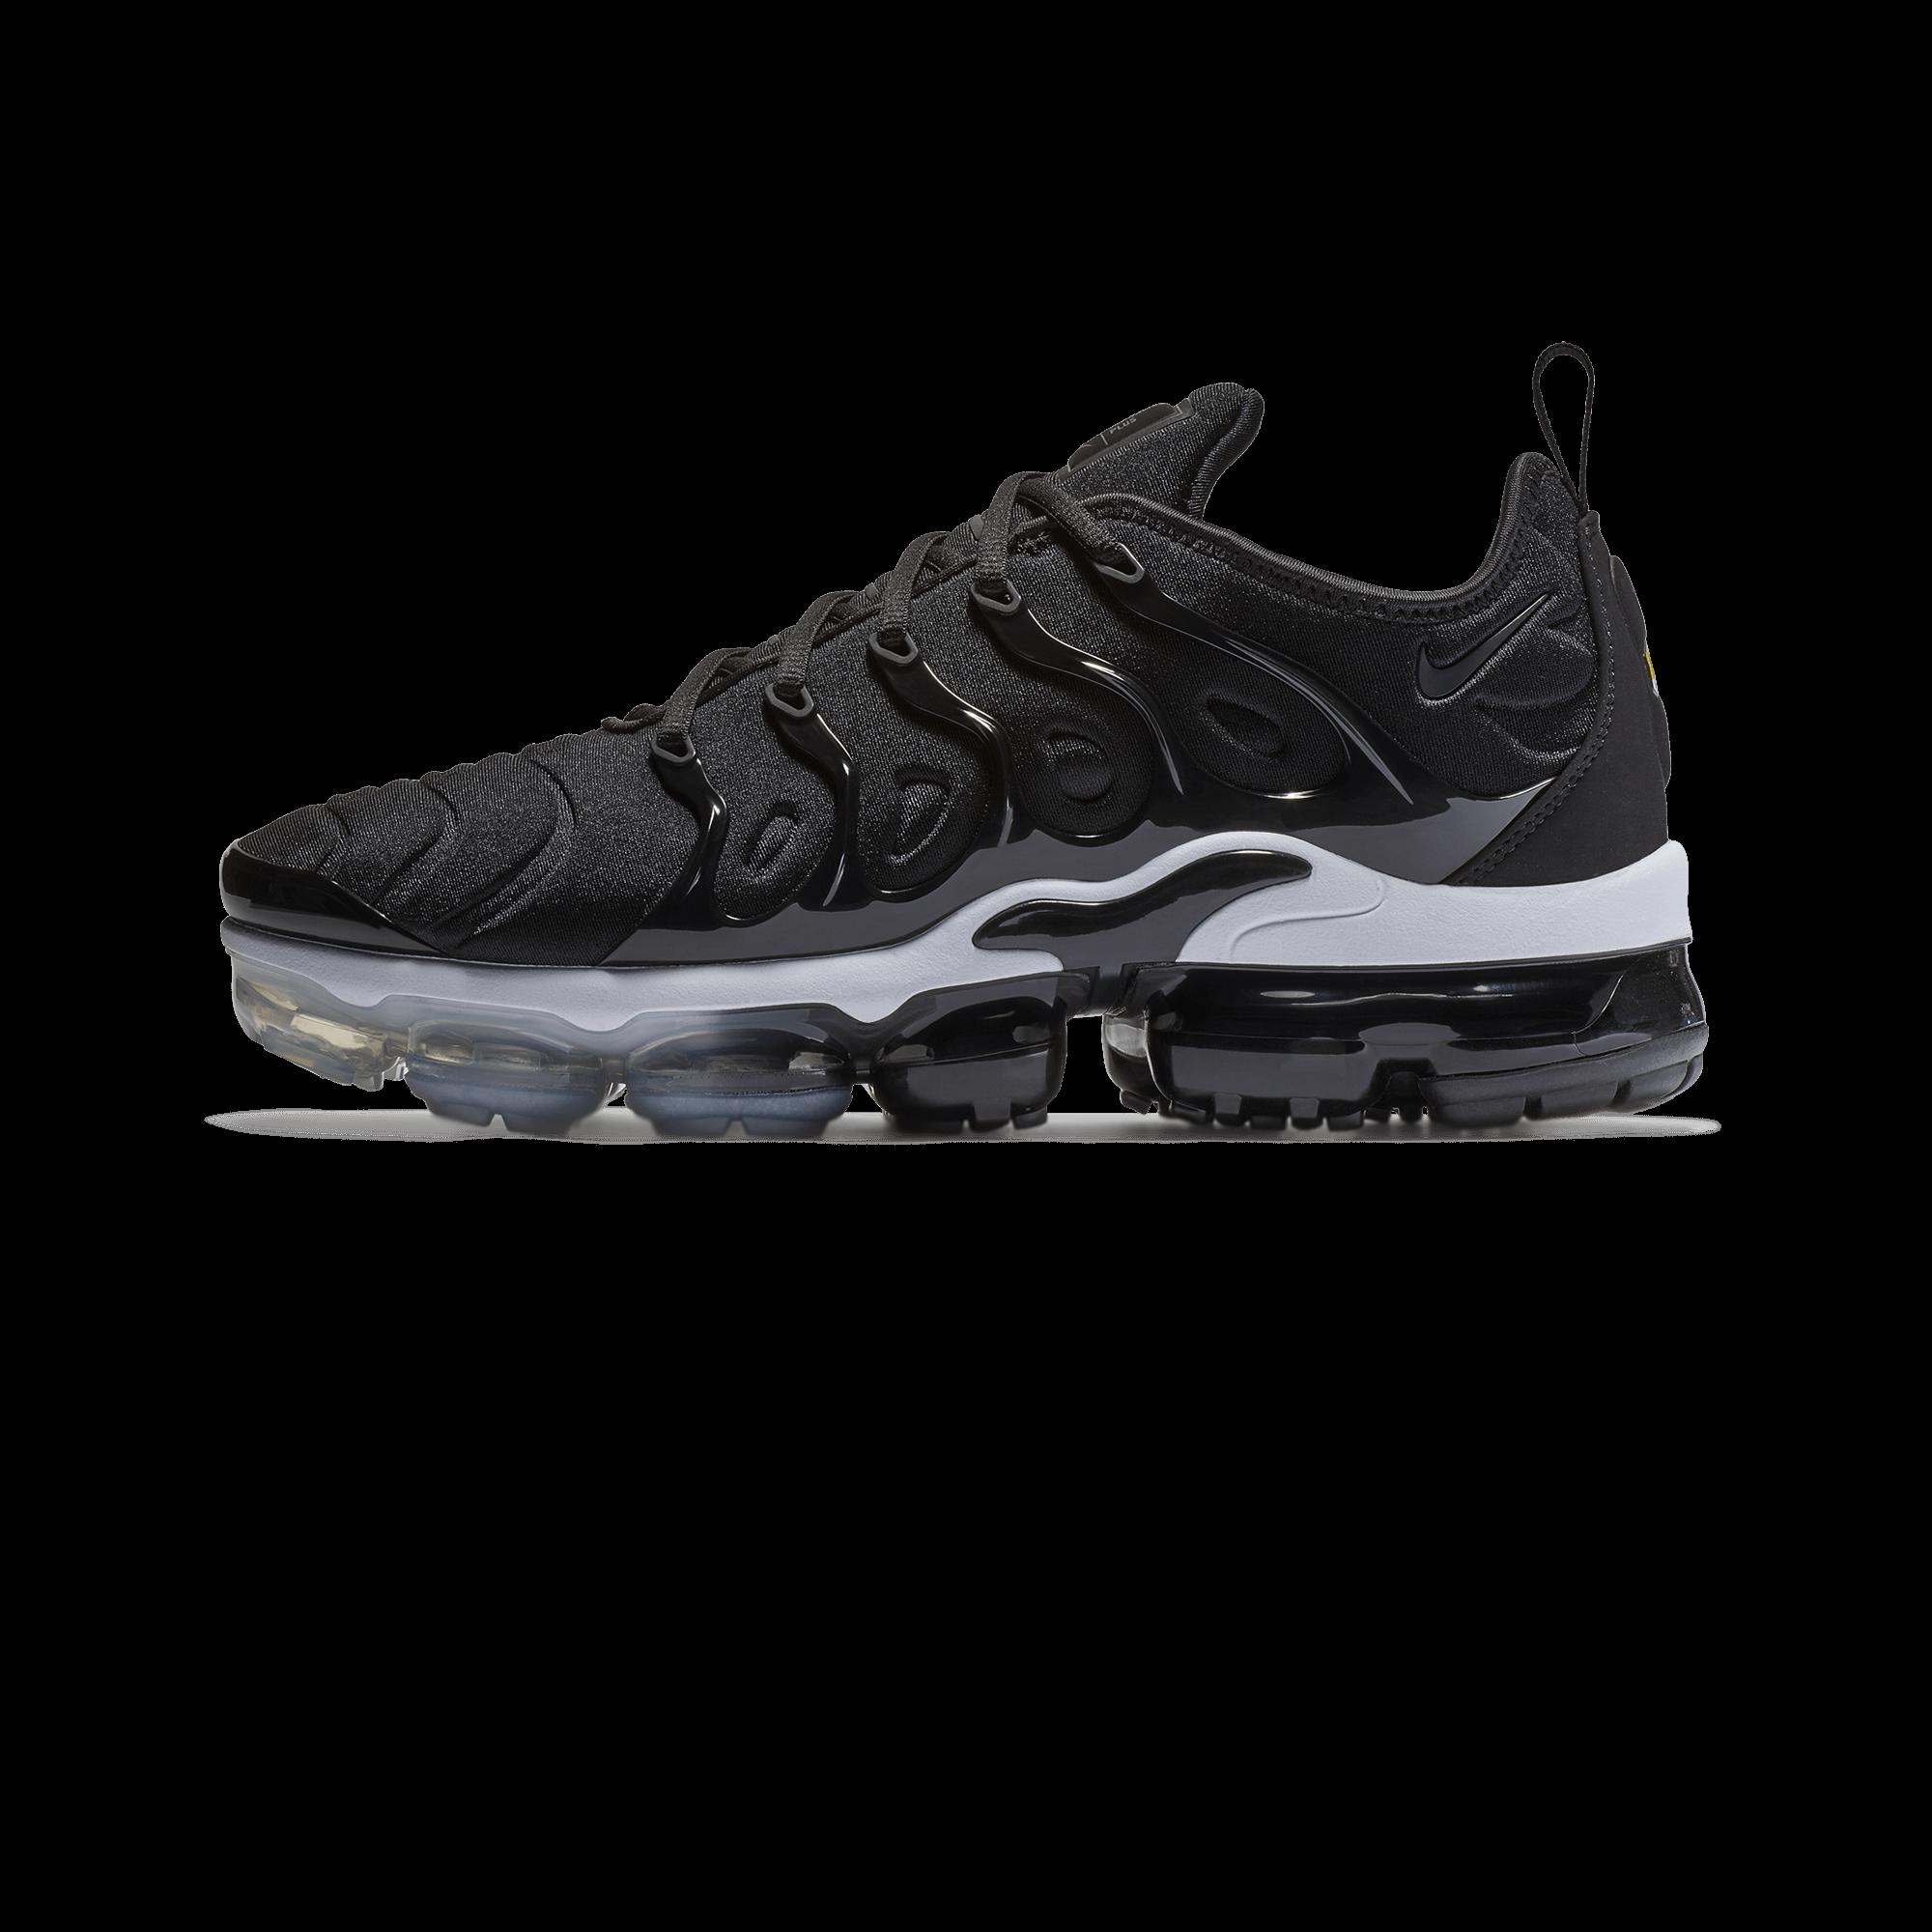 new styles 958d6 a39a5 Nike Air Vapormax Plus black / anthracite / white - Men | Holypopstore.com